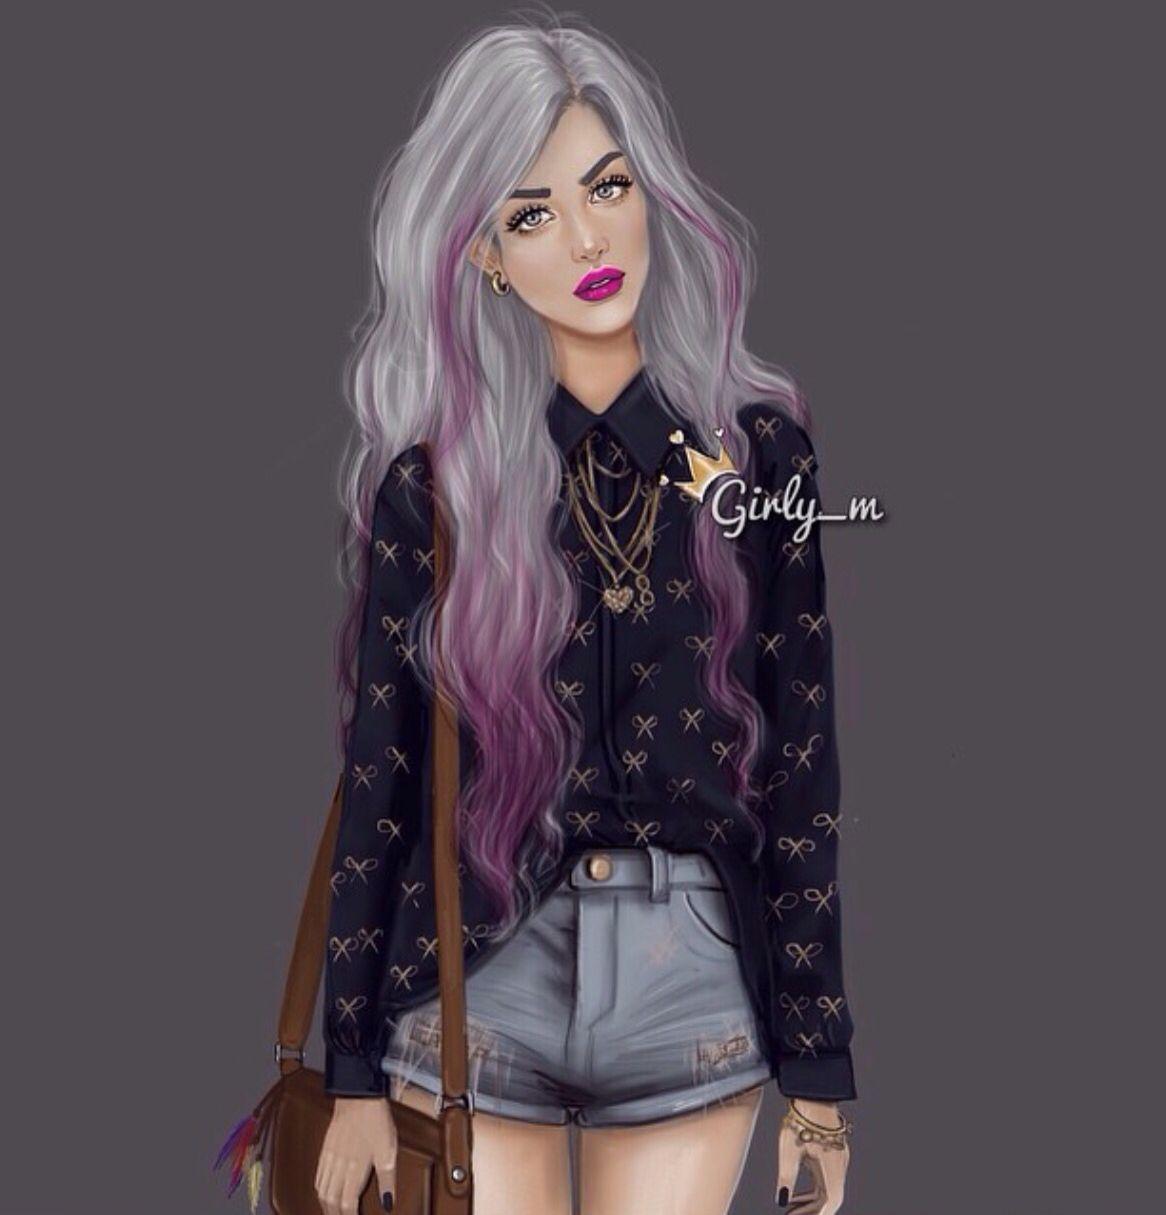 Nice Sad Girl Wallpaper Girly M Girly M Pinterest Girly Girl Sketch And